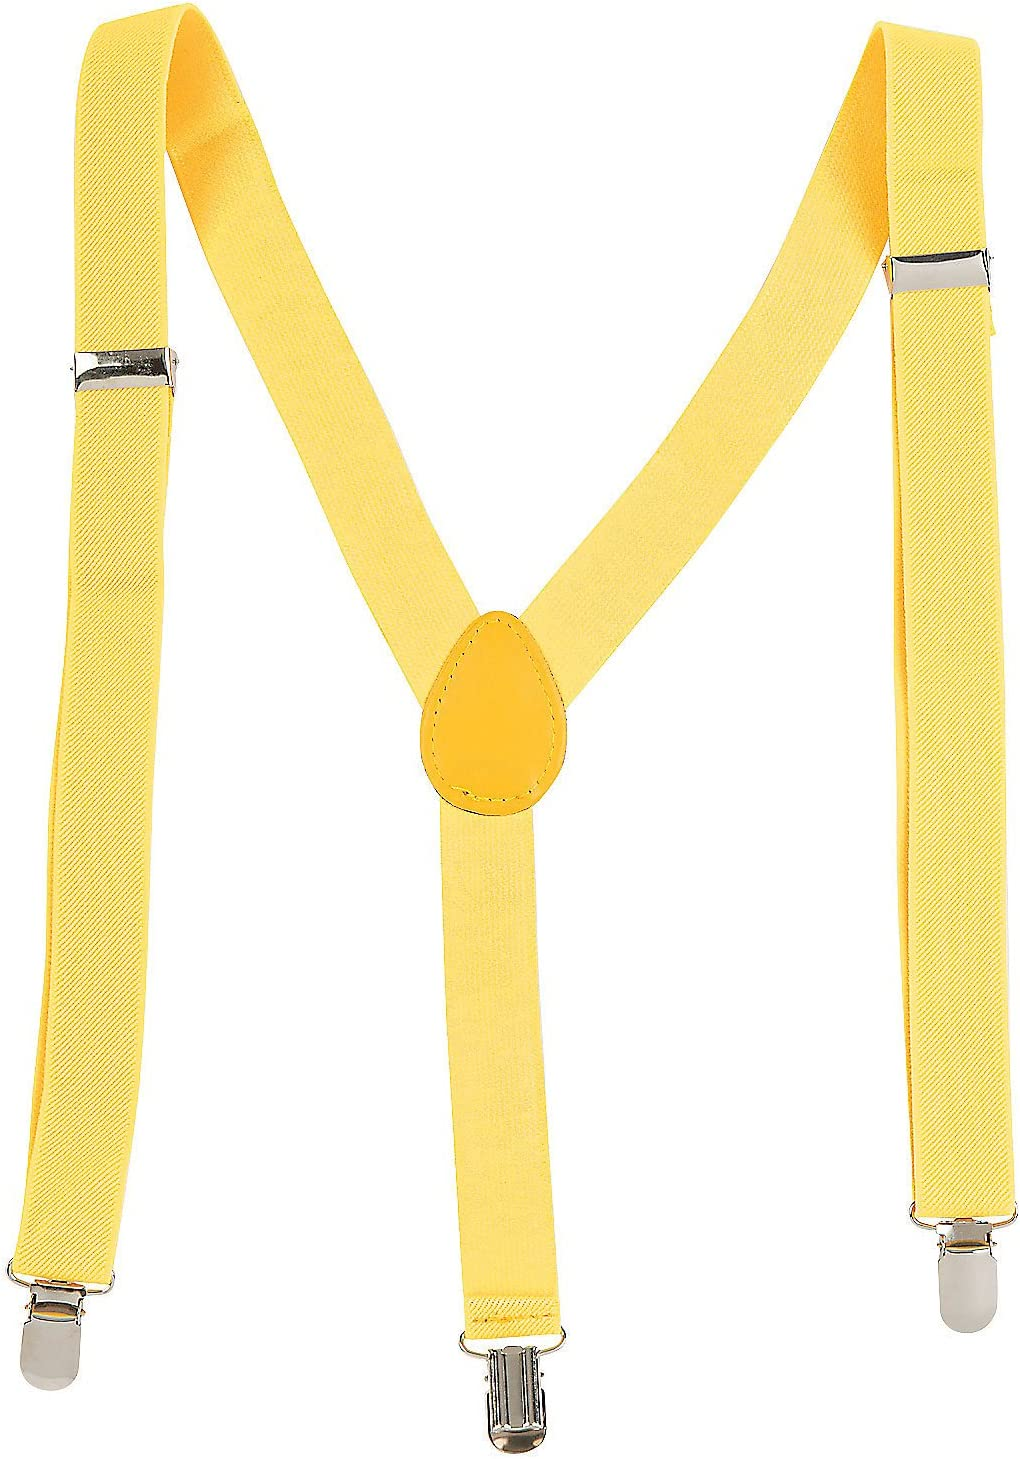 Fun Express Team Spirit Suspenders Yellow - Apparel Accessories - 1 Piece